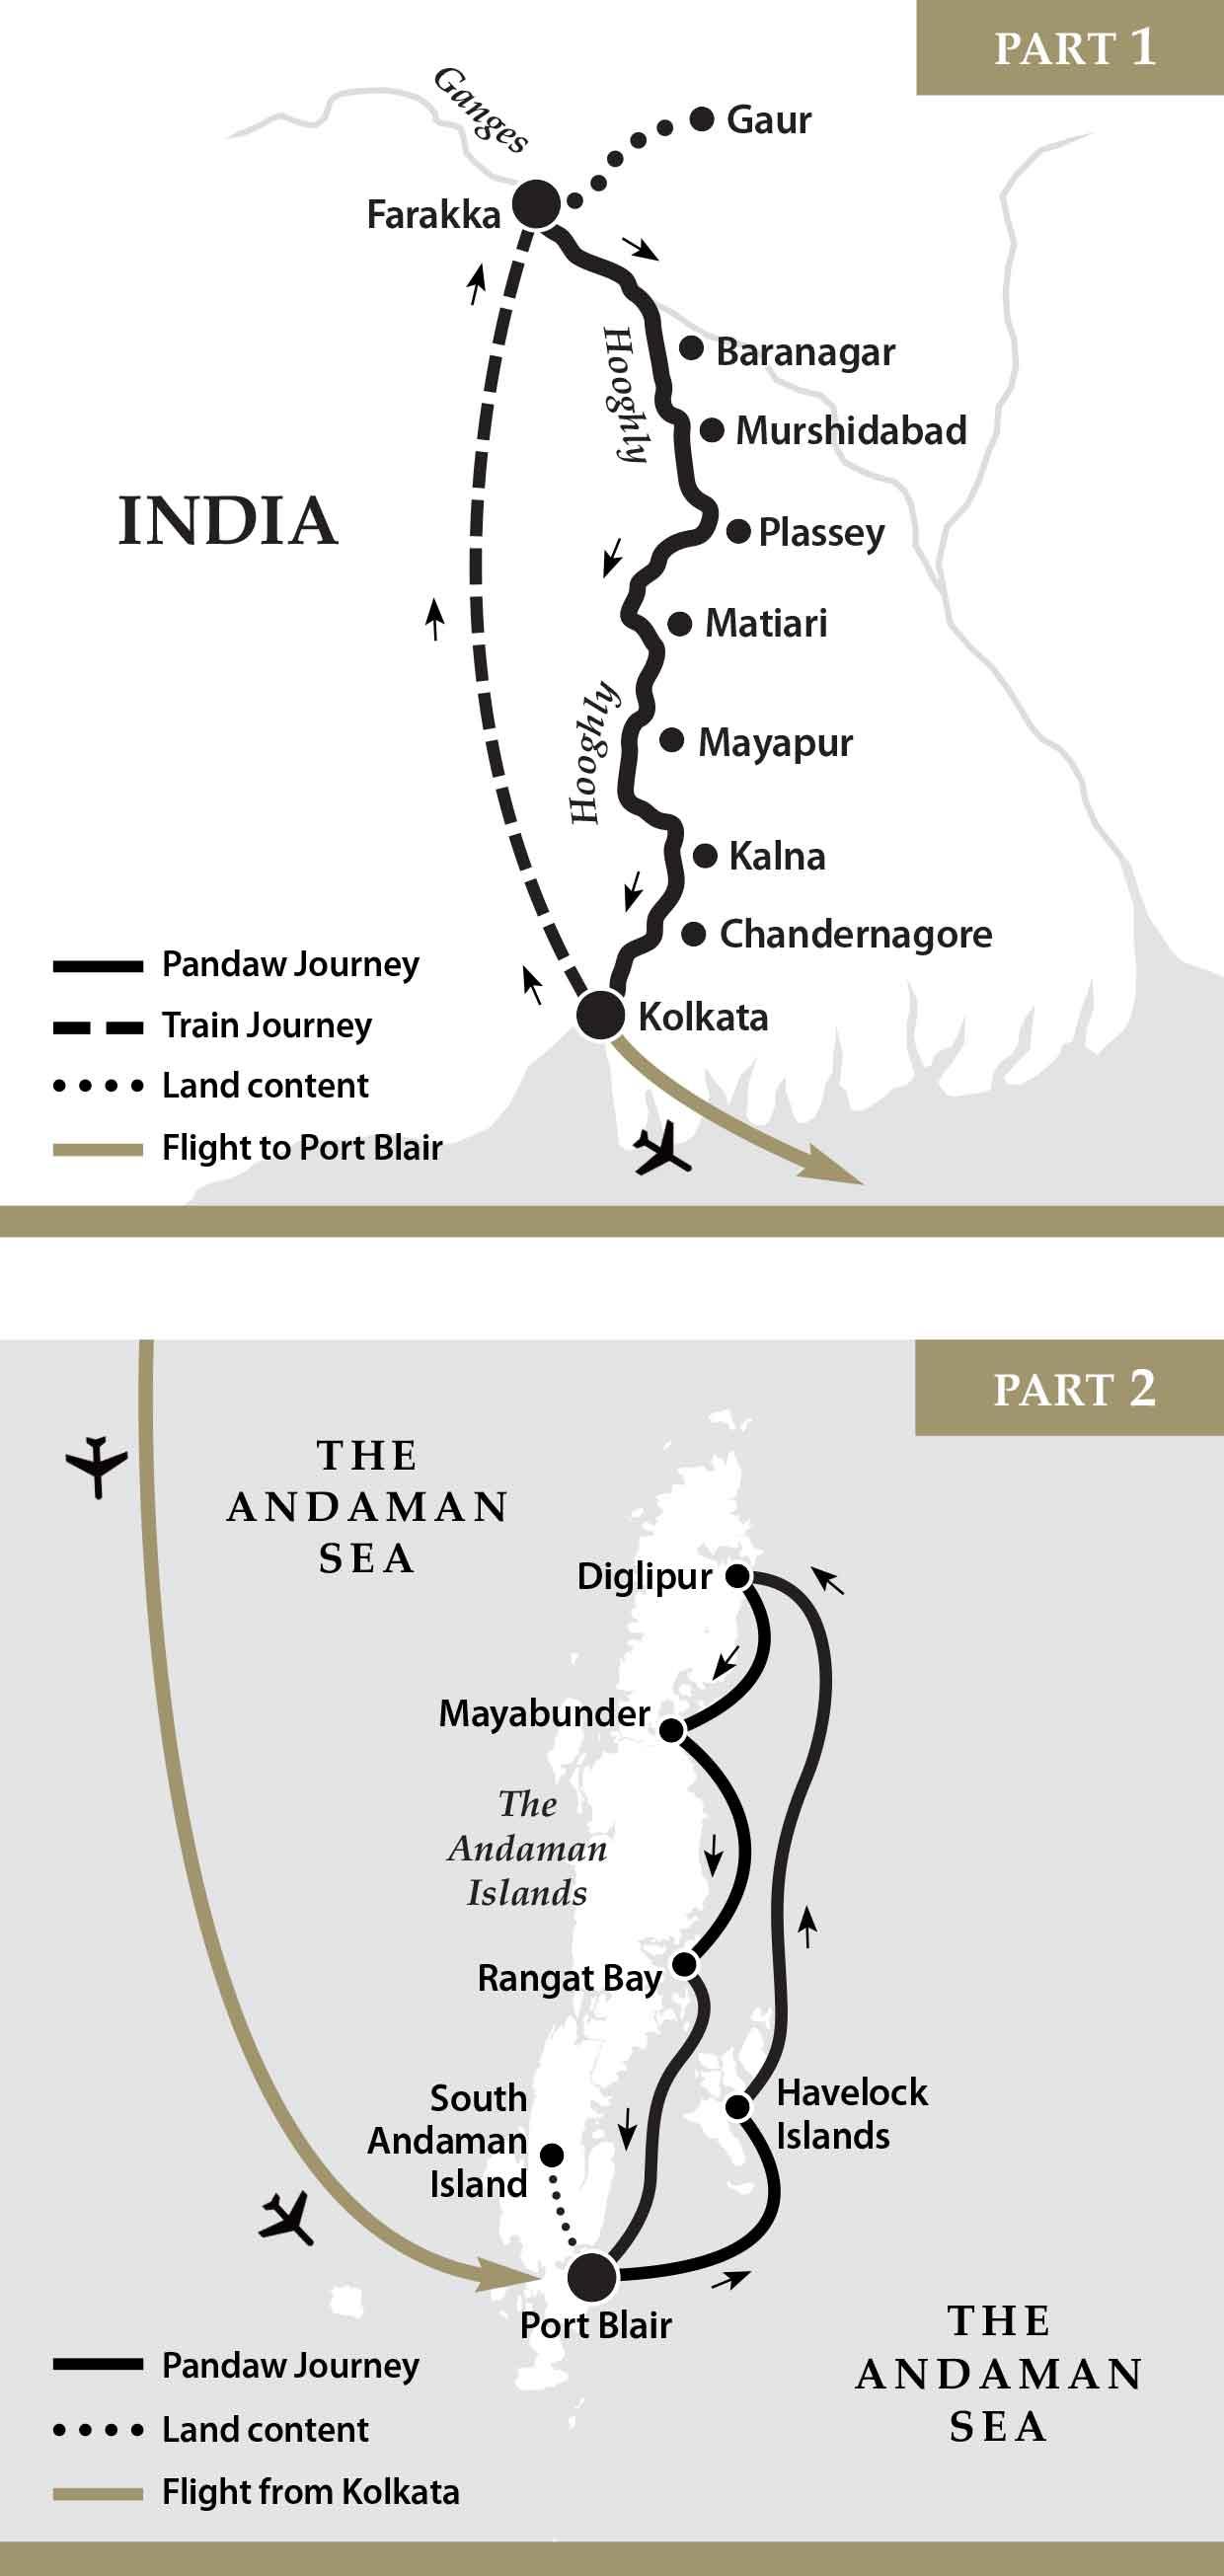 Map for Ganges River & Andaman Islands